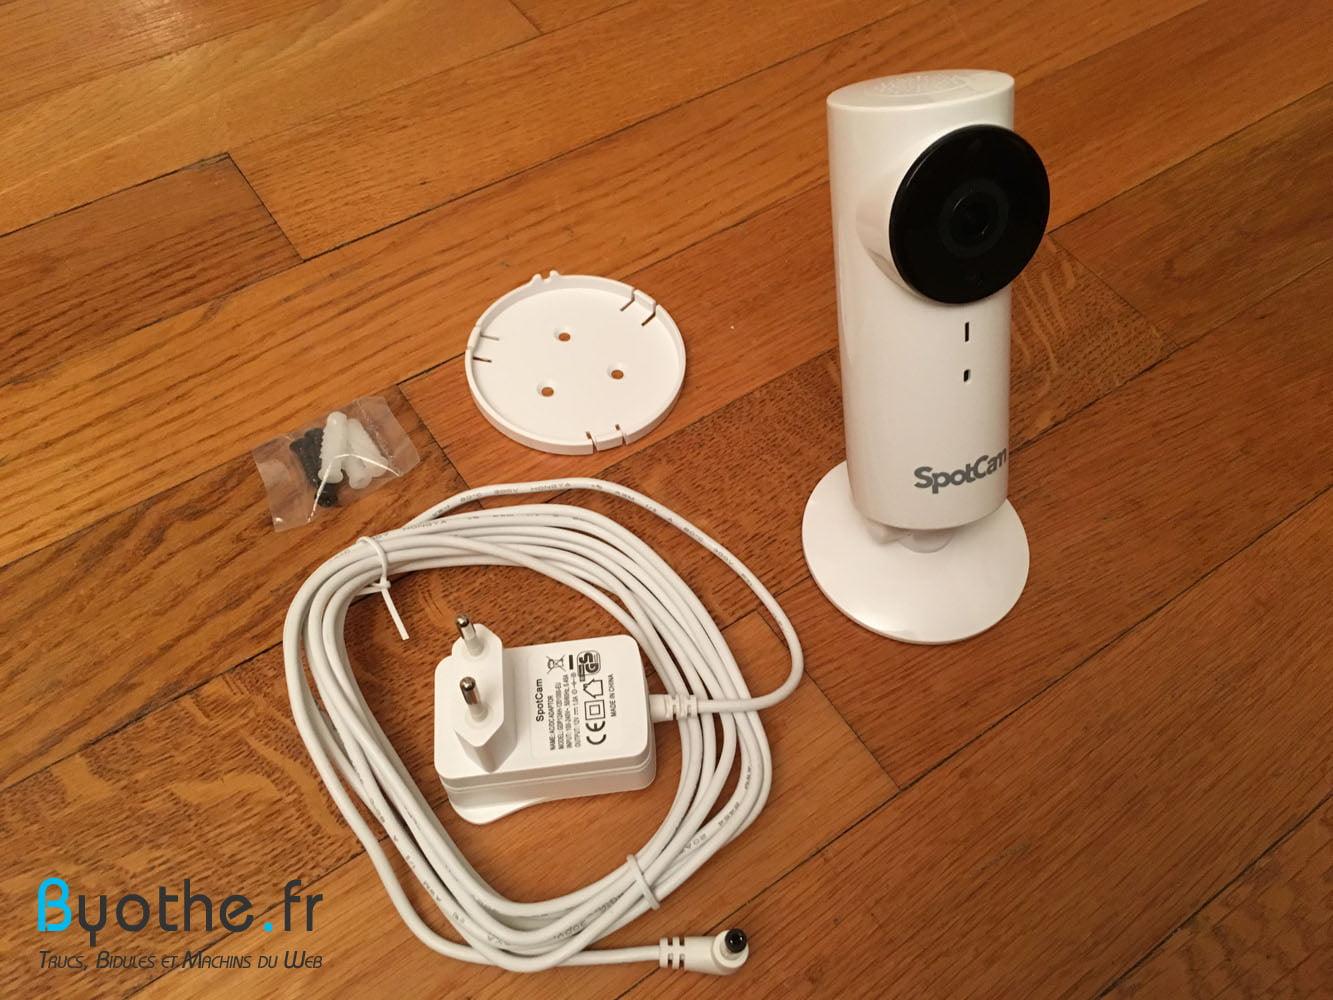 spotcam-contenu Test de la caméra de surveillance WiFi SpotCam HD